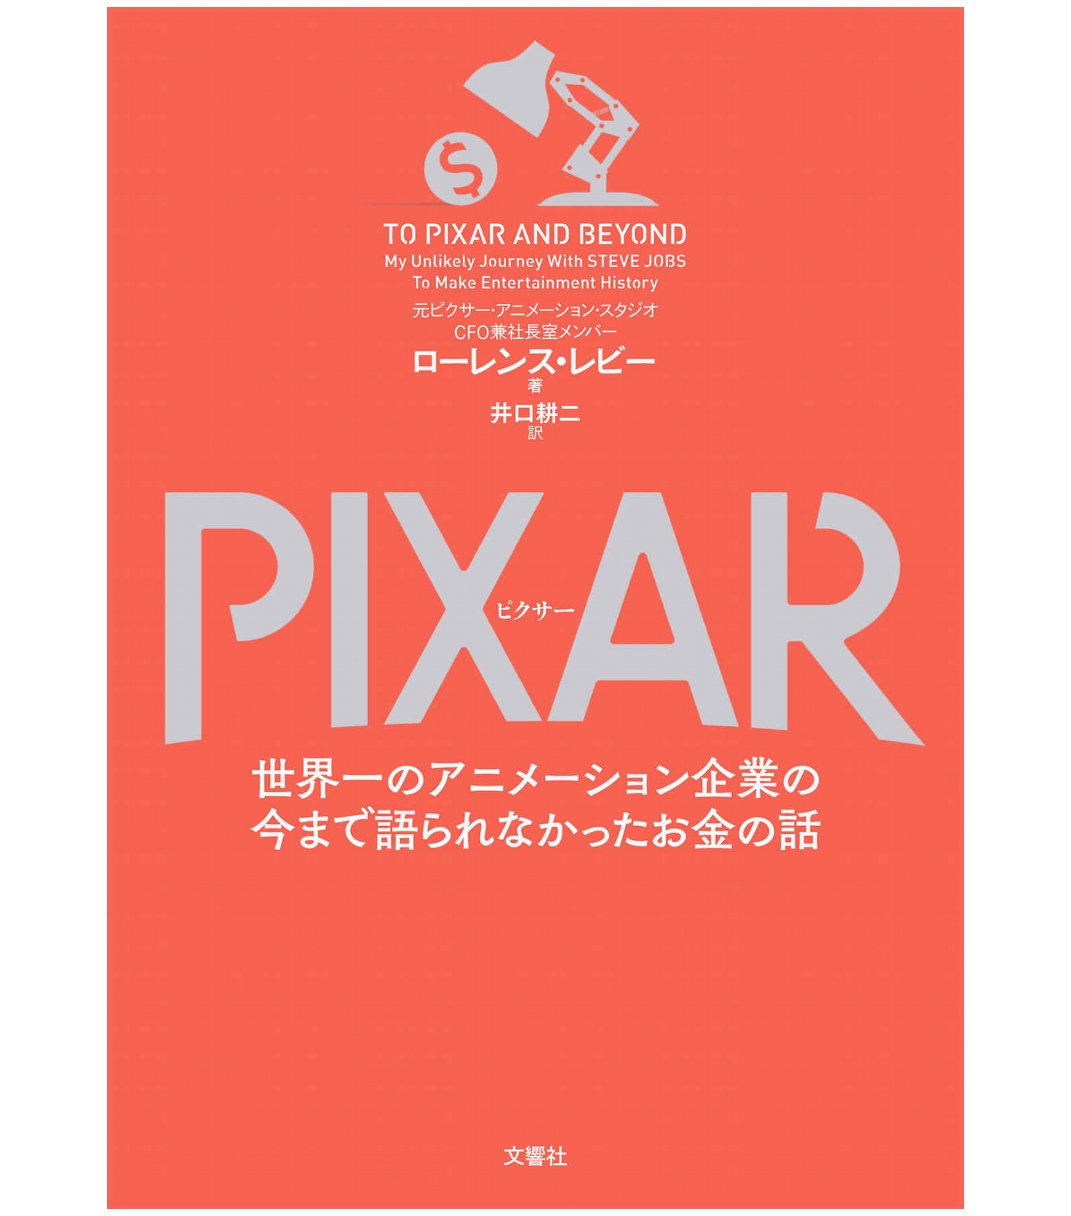 PIXARのストーリー【ローレンス・レビー】